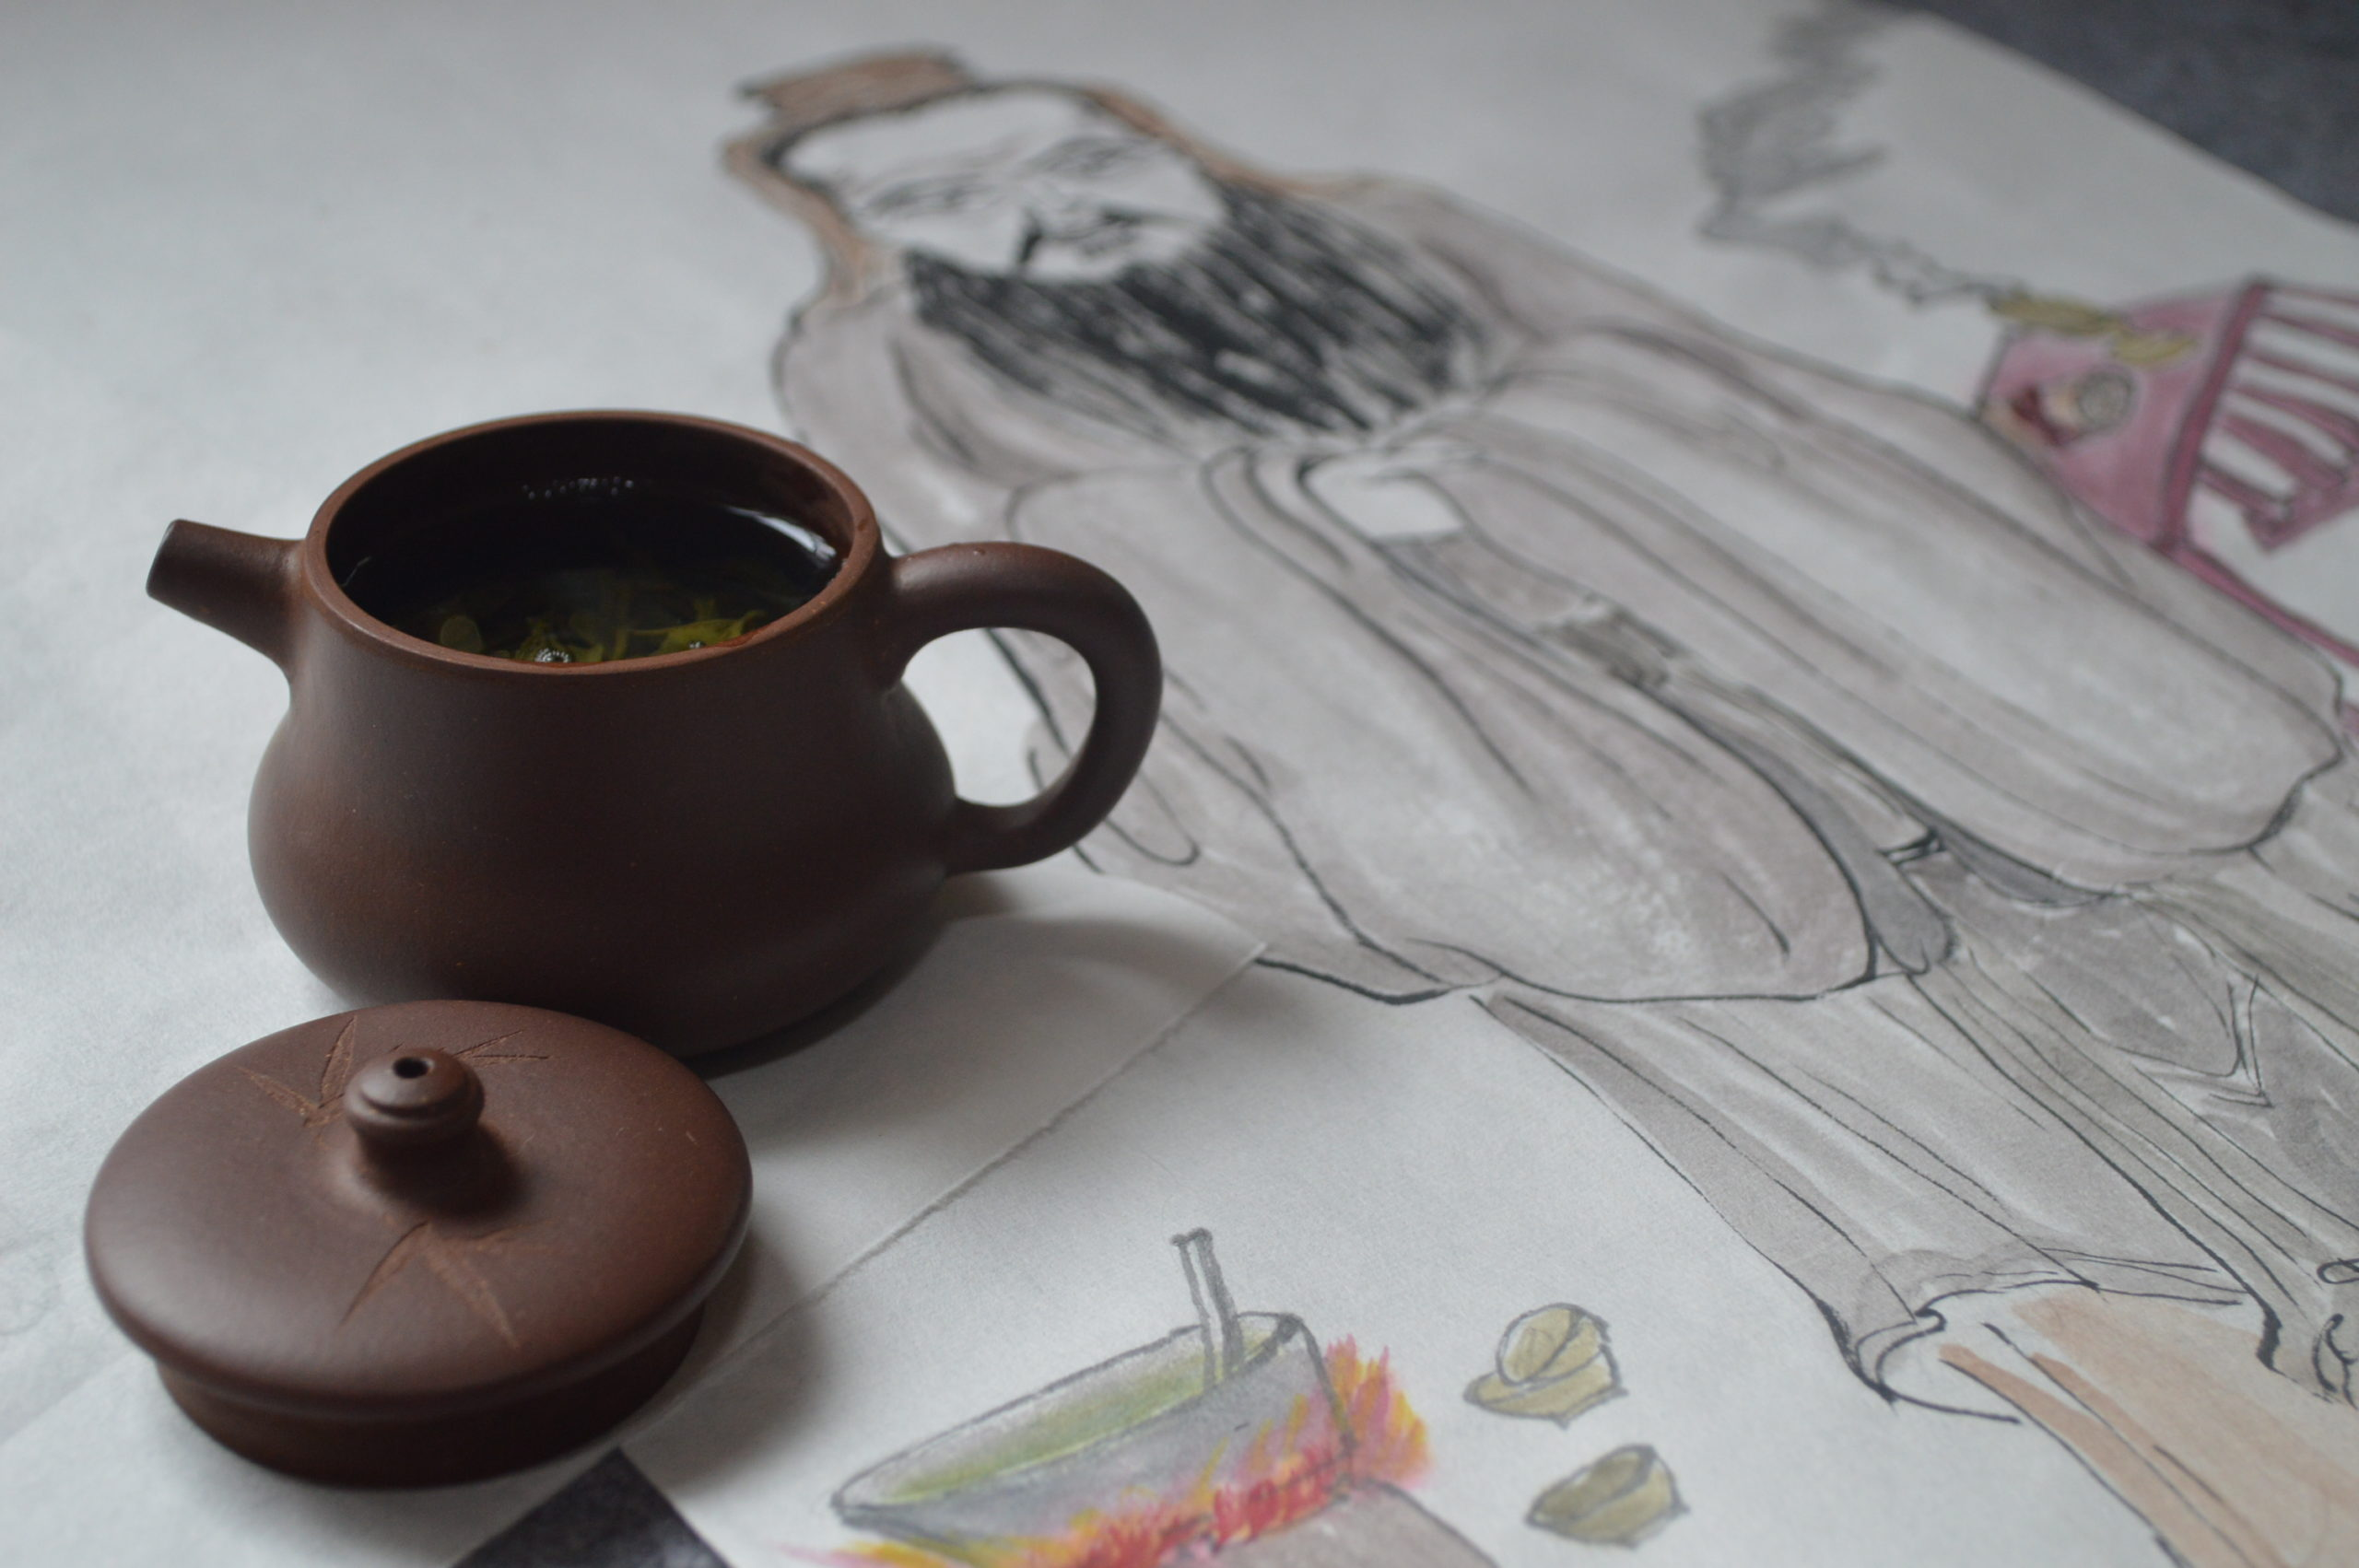 https://shop.liu-tea-art.com/wp-content/uploads/2020/08/DSC_0056-scaled.jpg